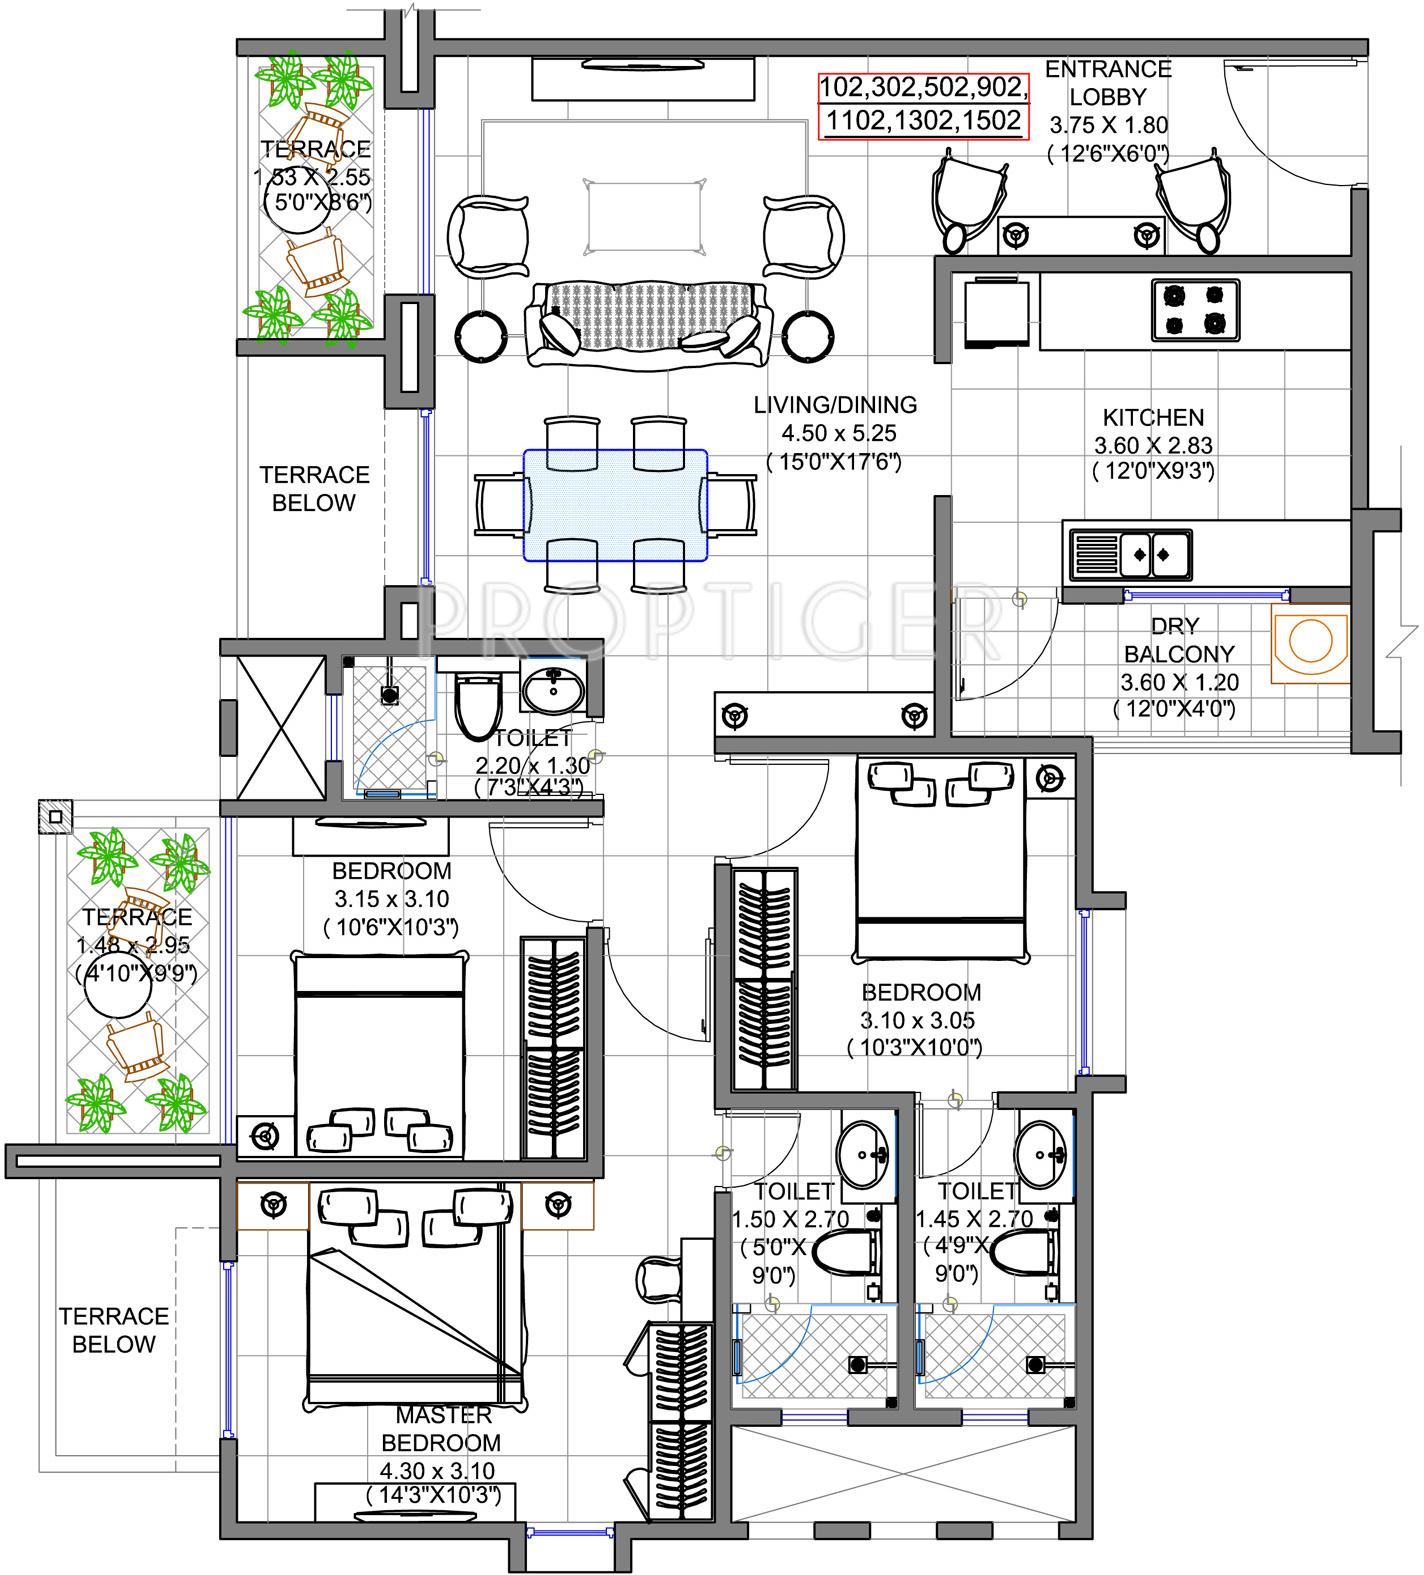 93+ Home Design 3d Deluxe Download - House Design Plan 3d Home ...